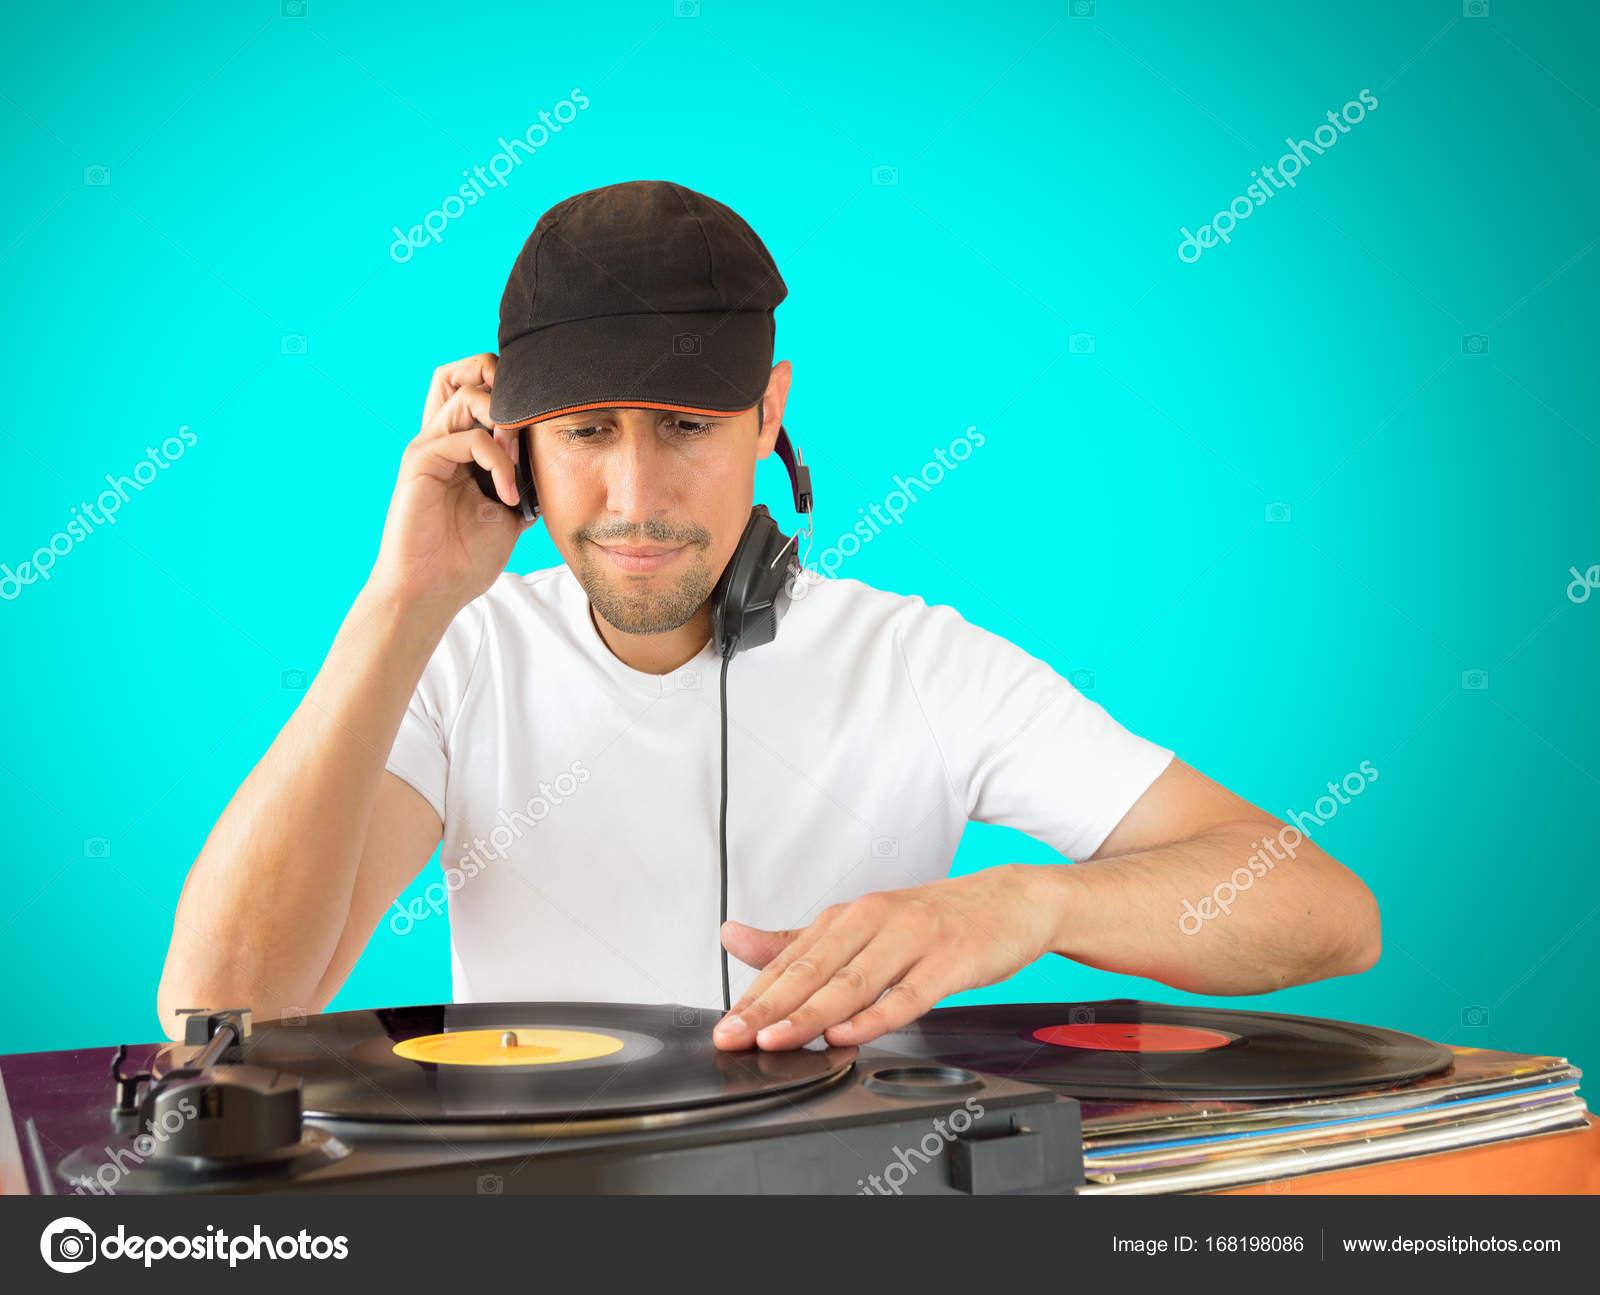 Dj mixing auf der party u2014 stockfoto © nanaplus #168198086